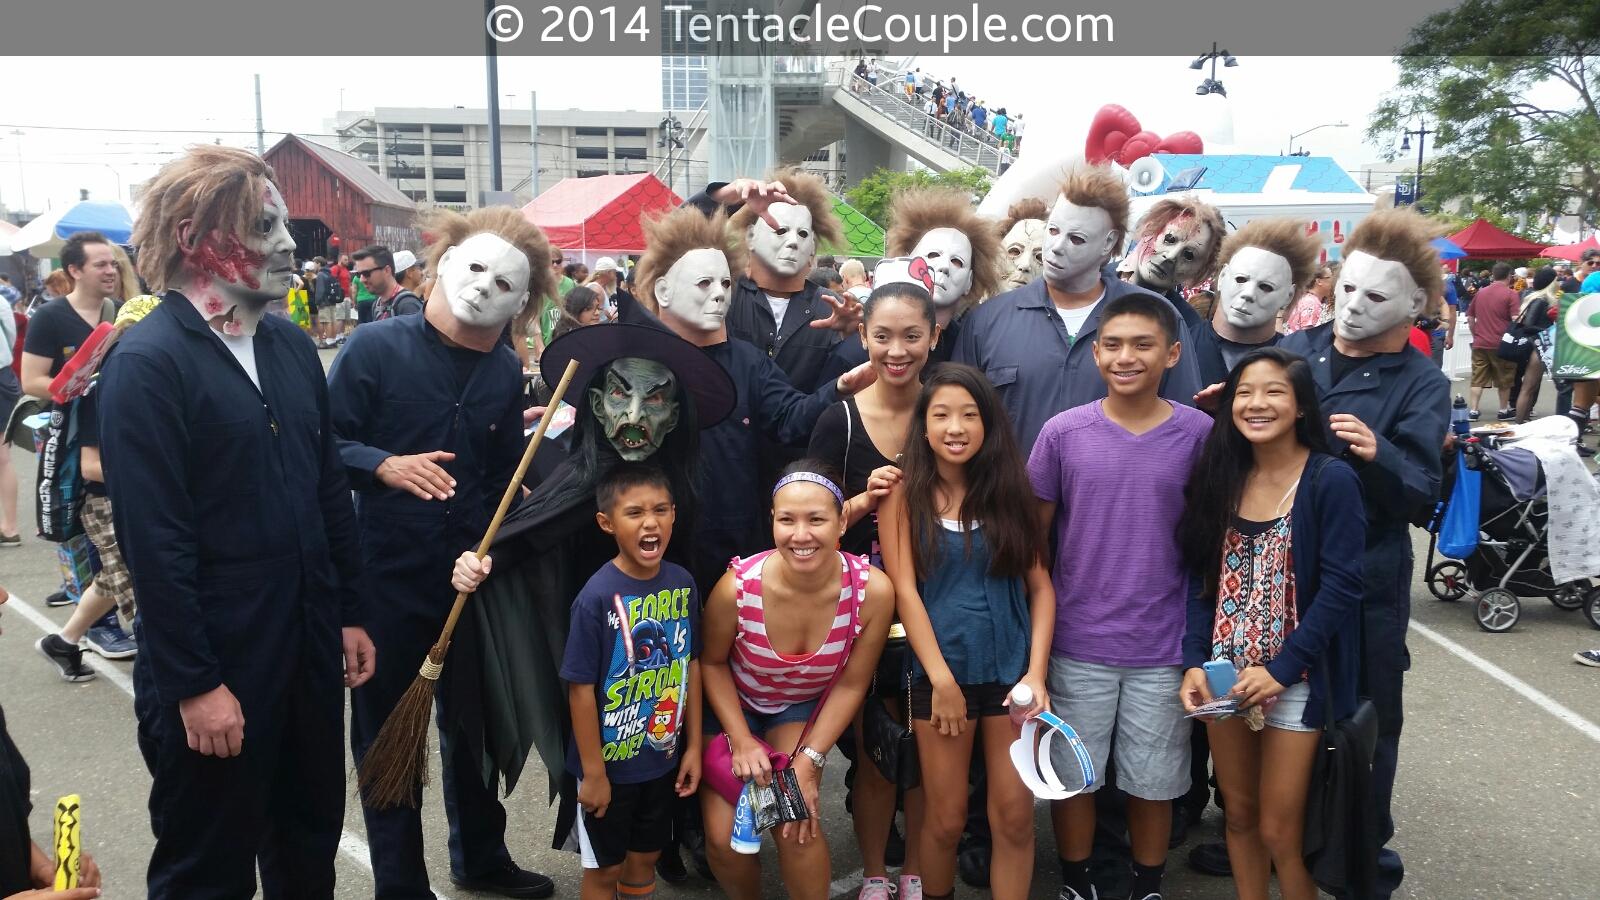 San Diego Comic Con, a safe, family friendly environment